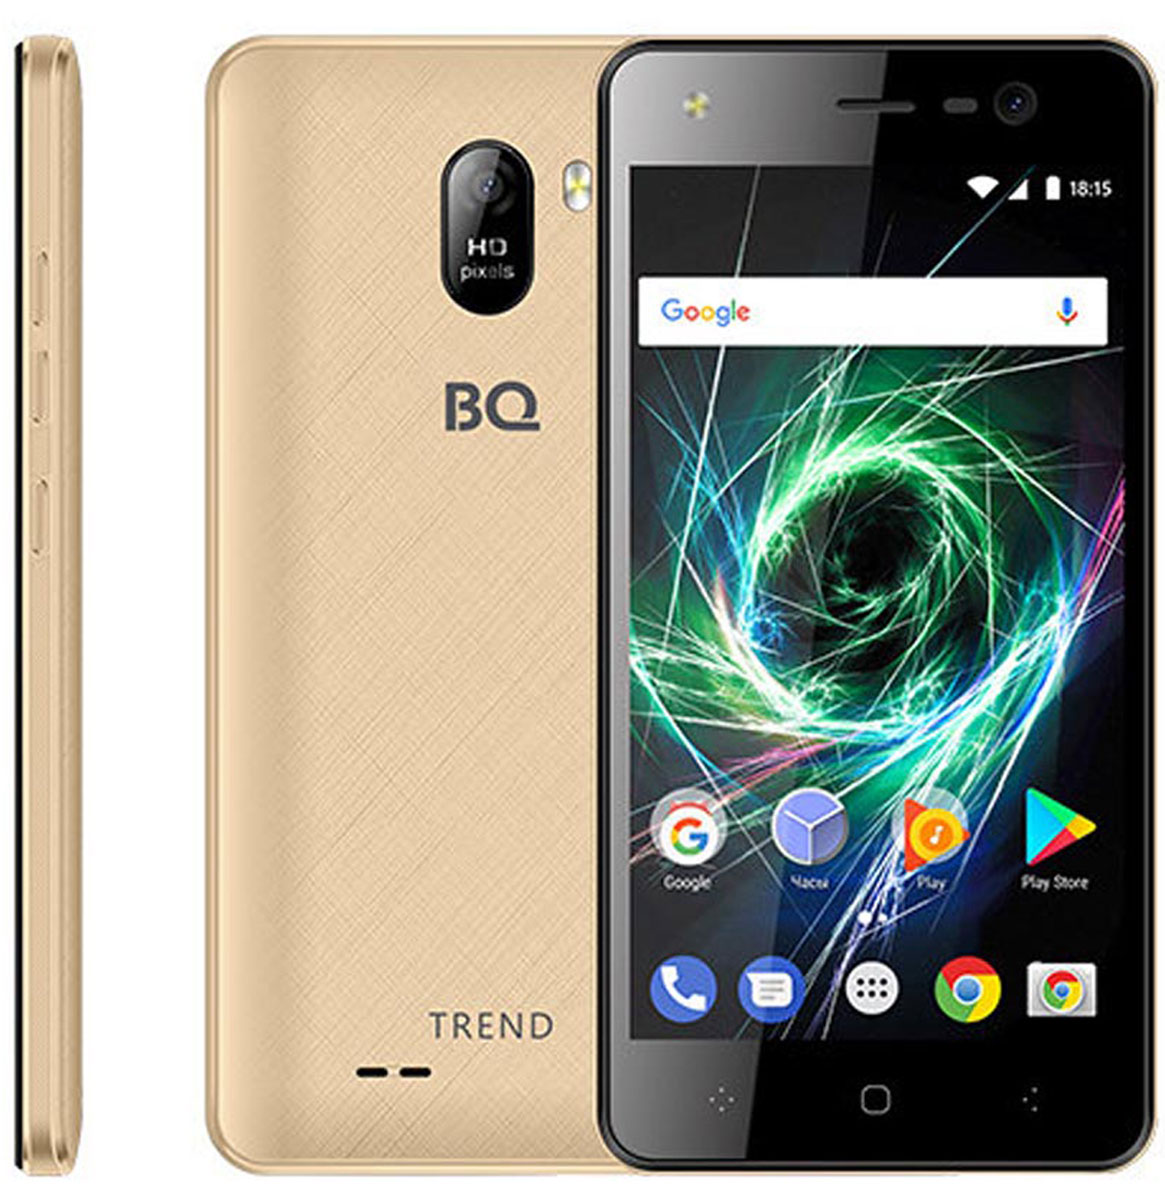 BQ 5009L Trend, Gold BQ Mobile